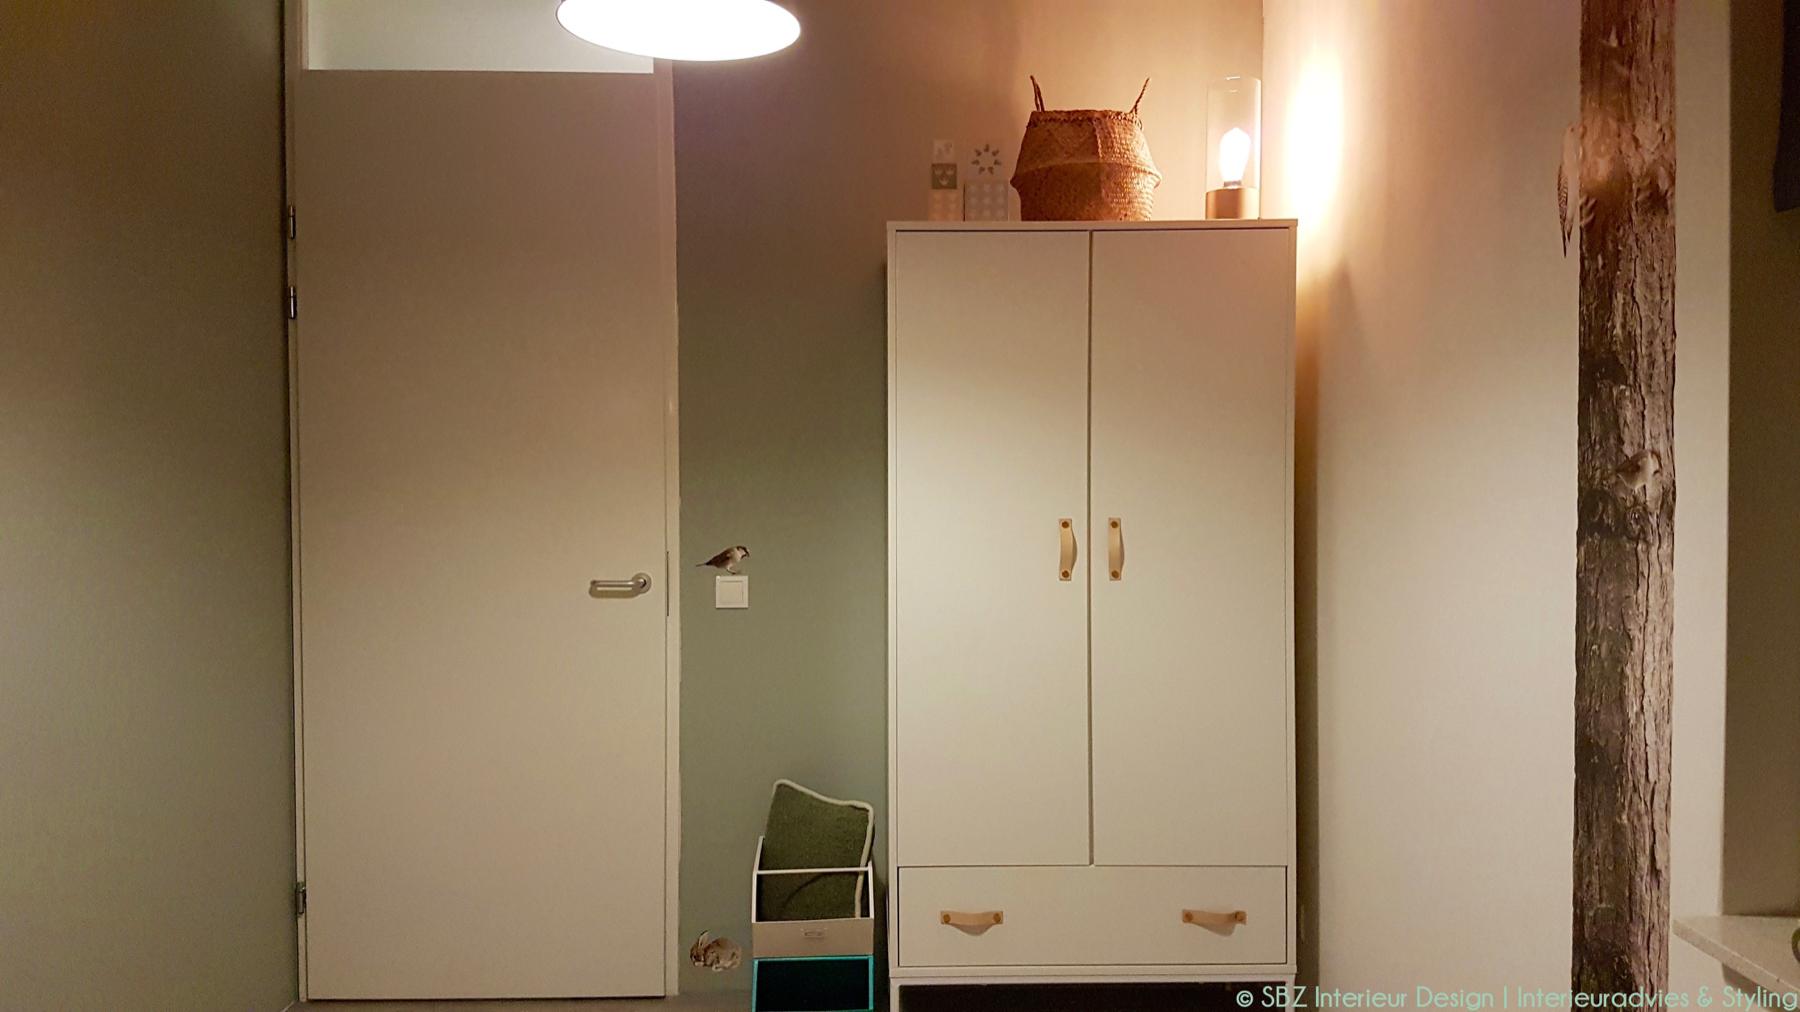 Babykamertrends. Interieur styling babykamer door SBZ Interieur Design 32_1800x1012